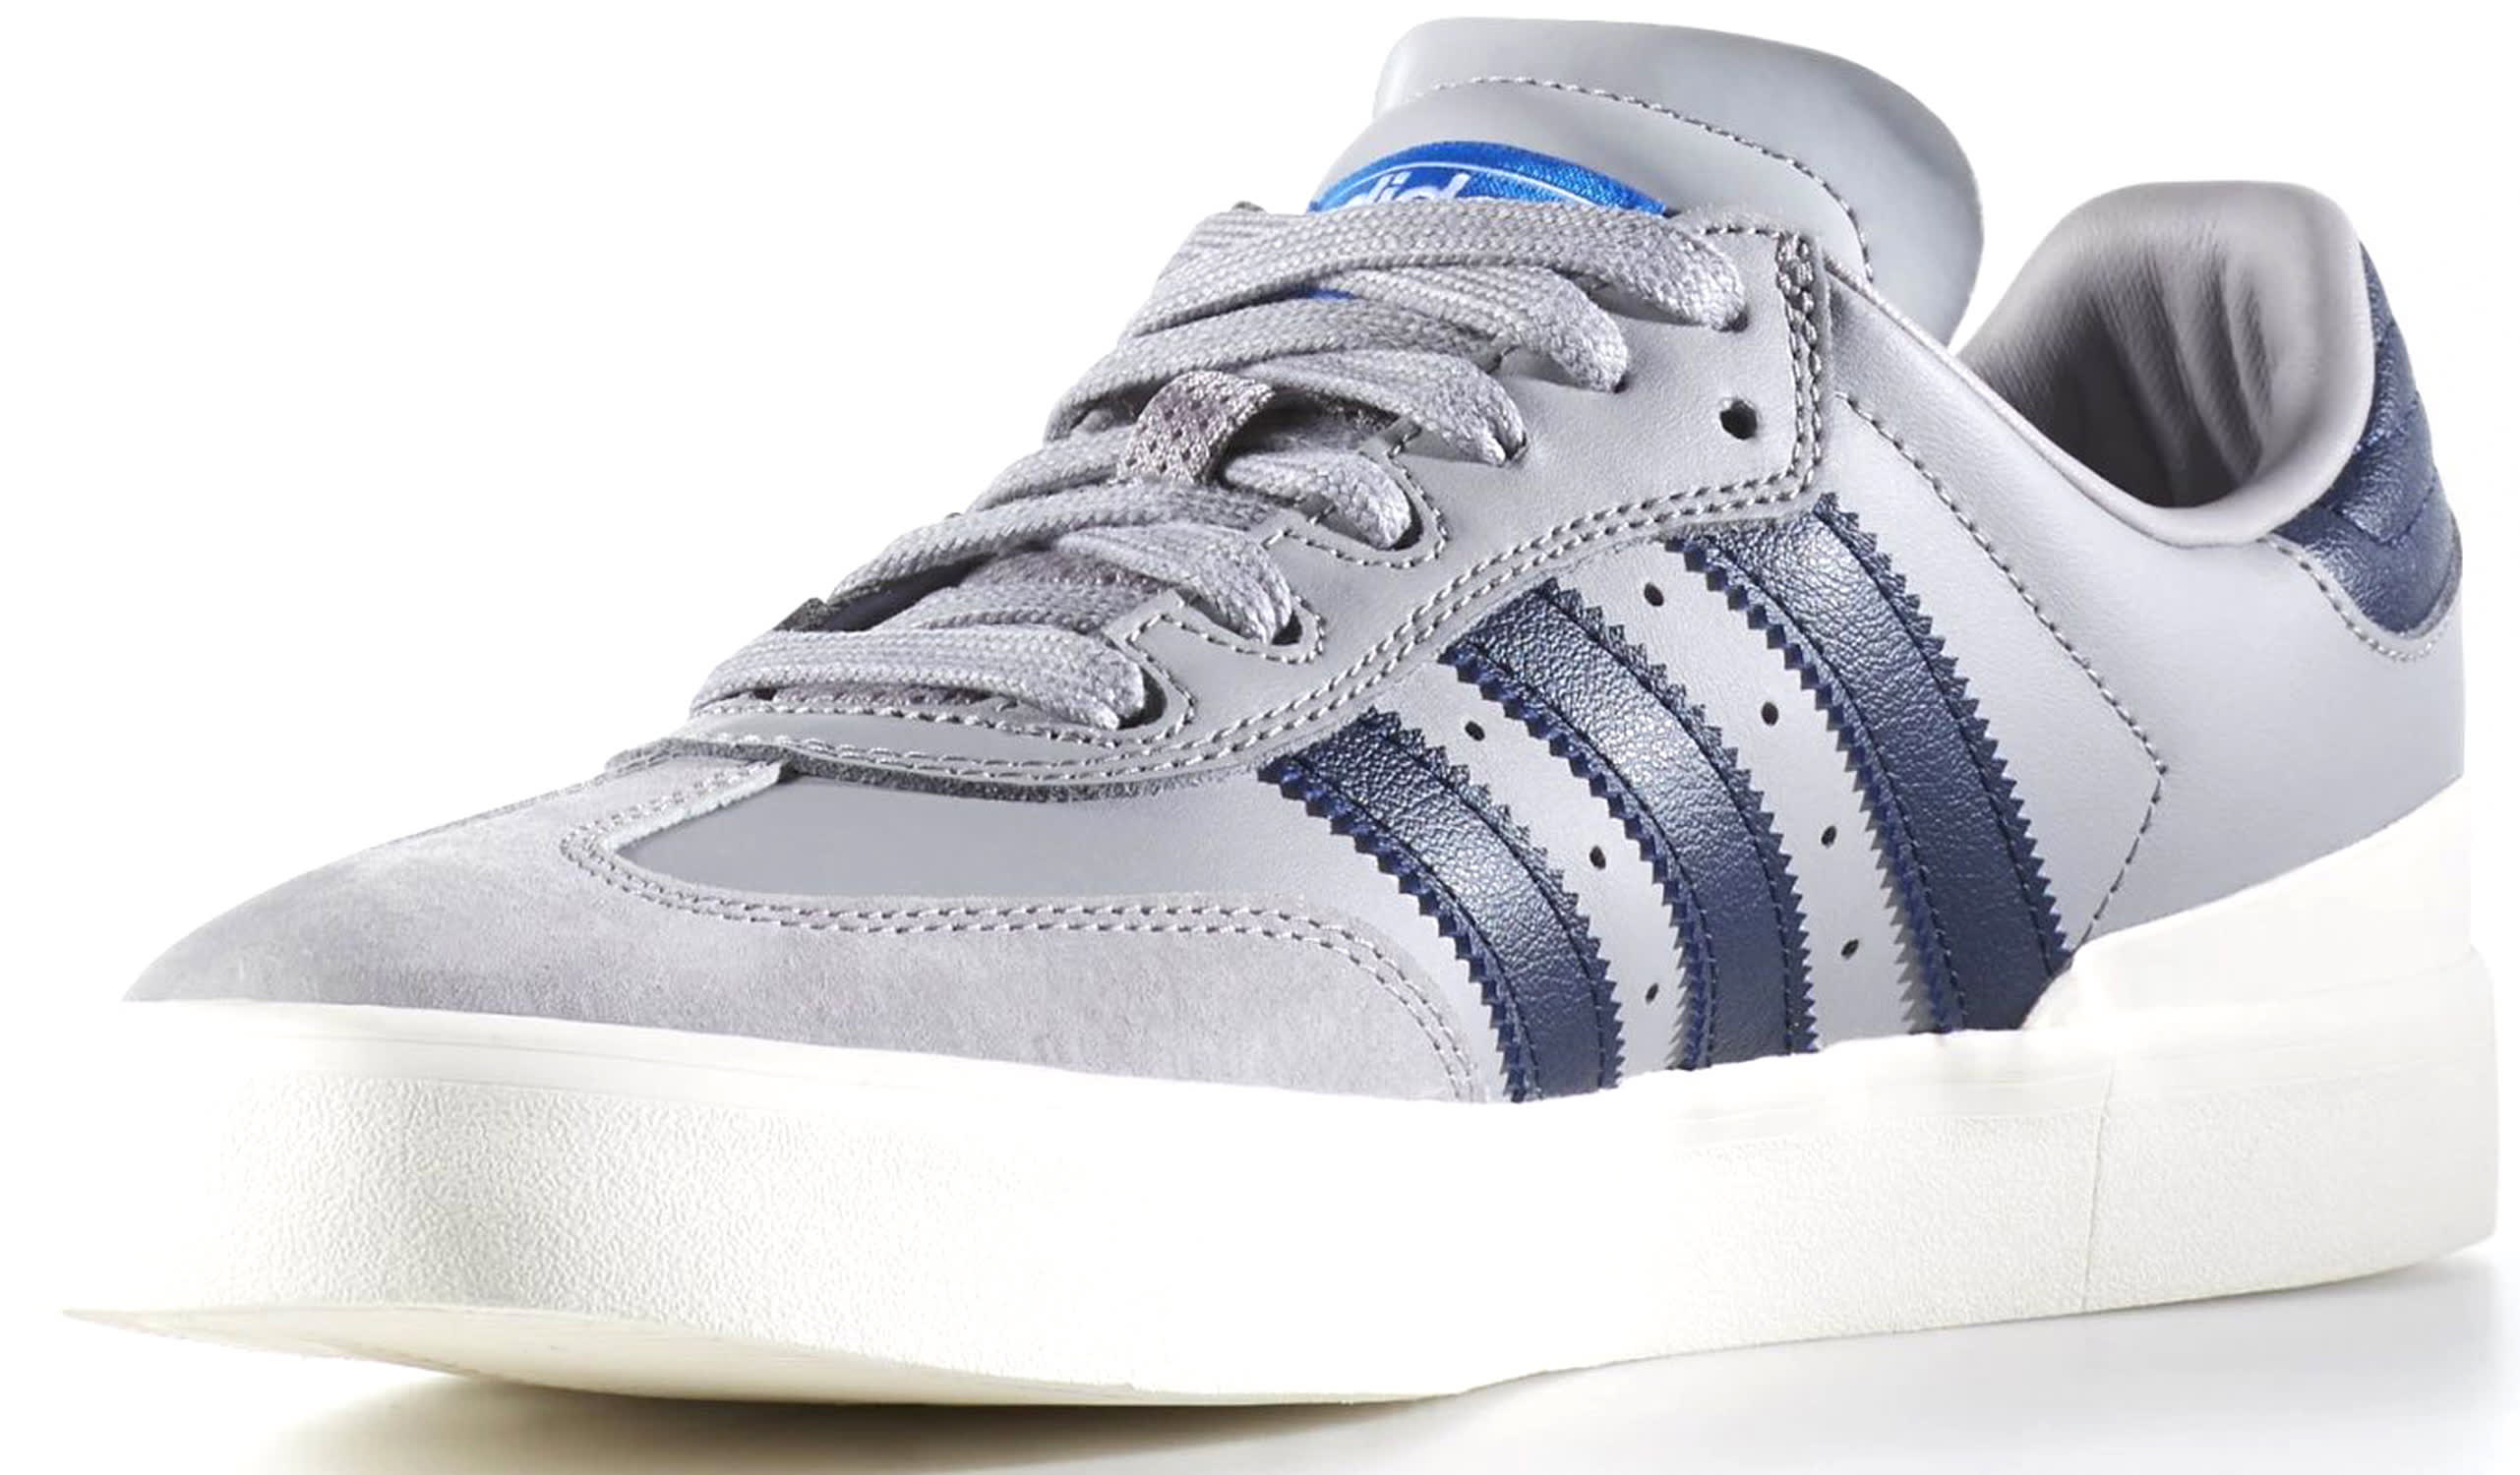 premium selection 5debb c18ed Adidas Busenitz Vulc Samba Edition Skate Shoes - thumbnail 2